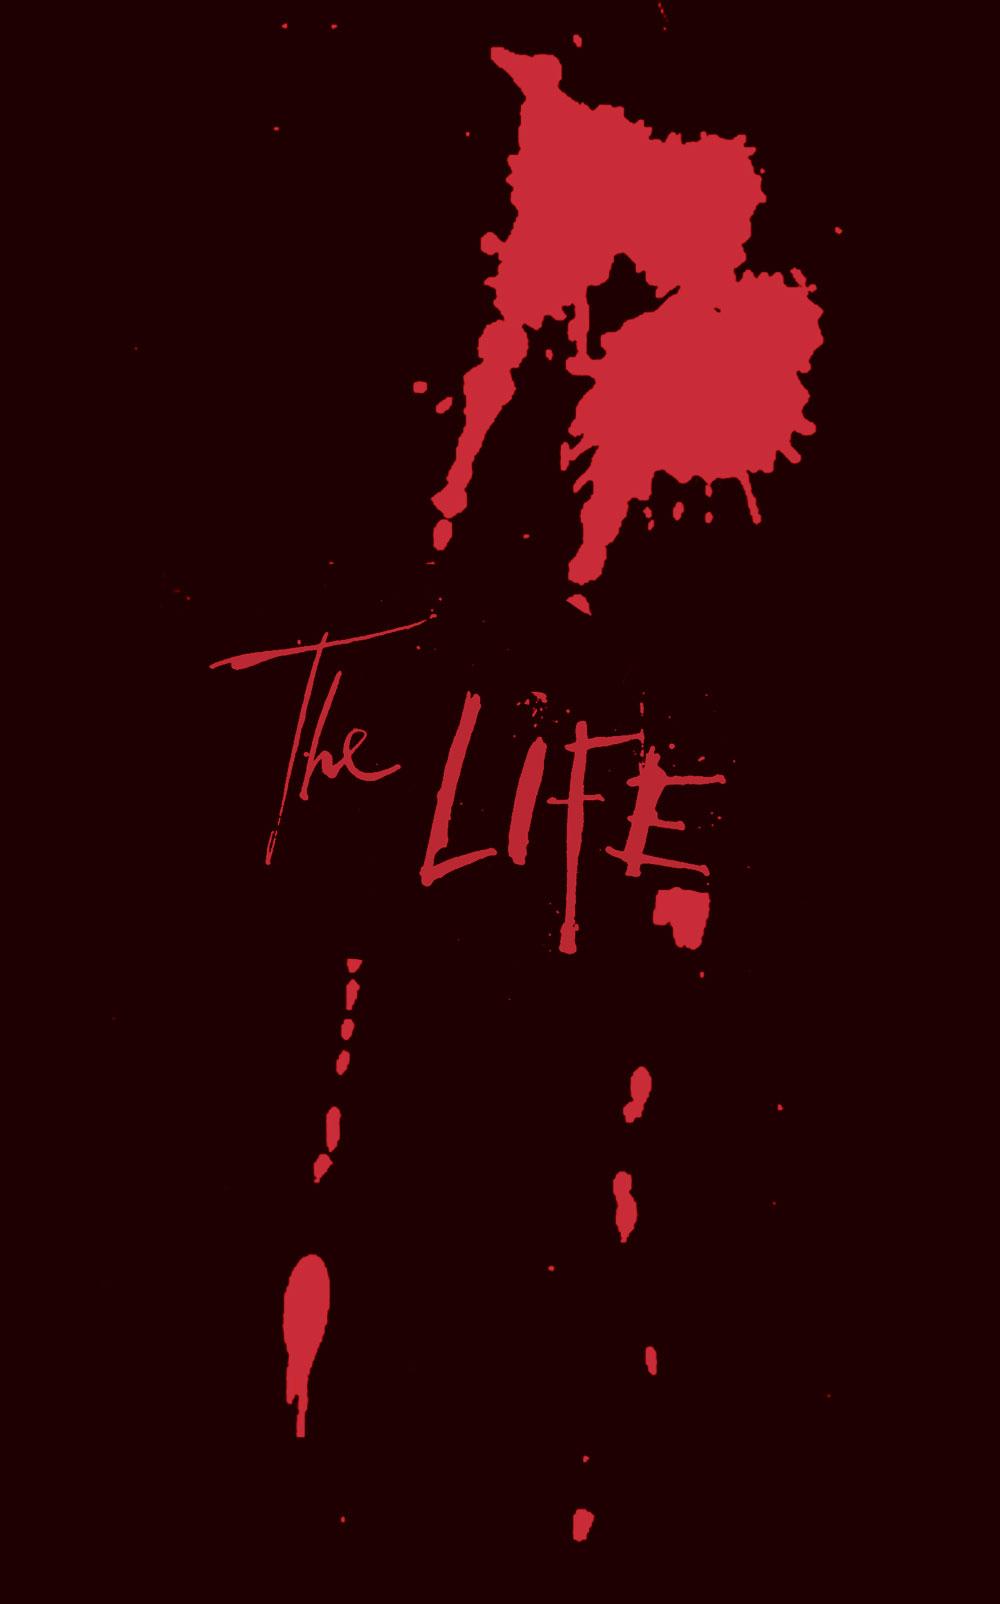 The-Life.jpg